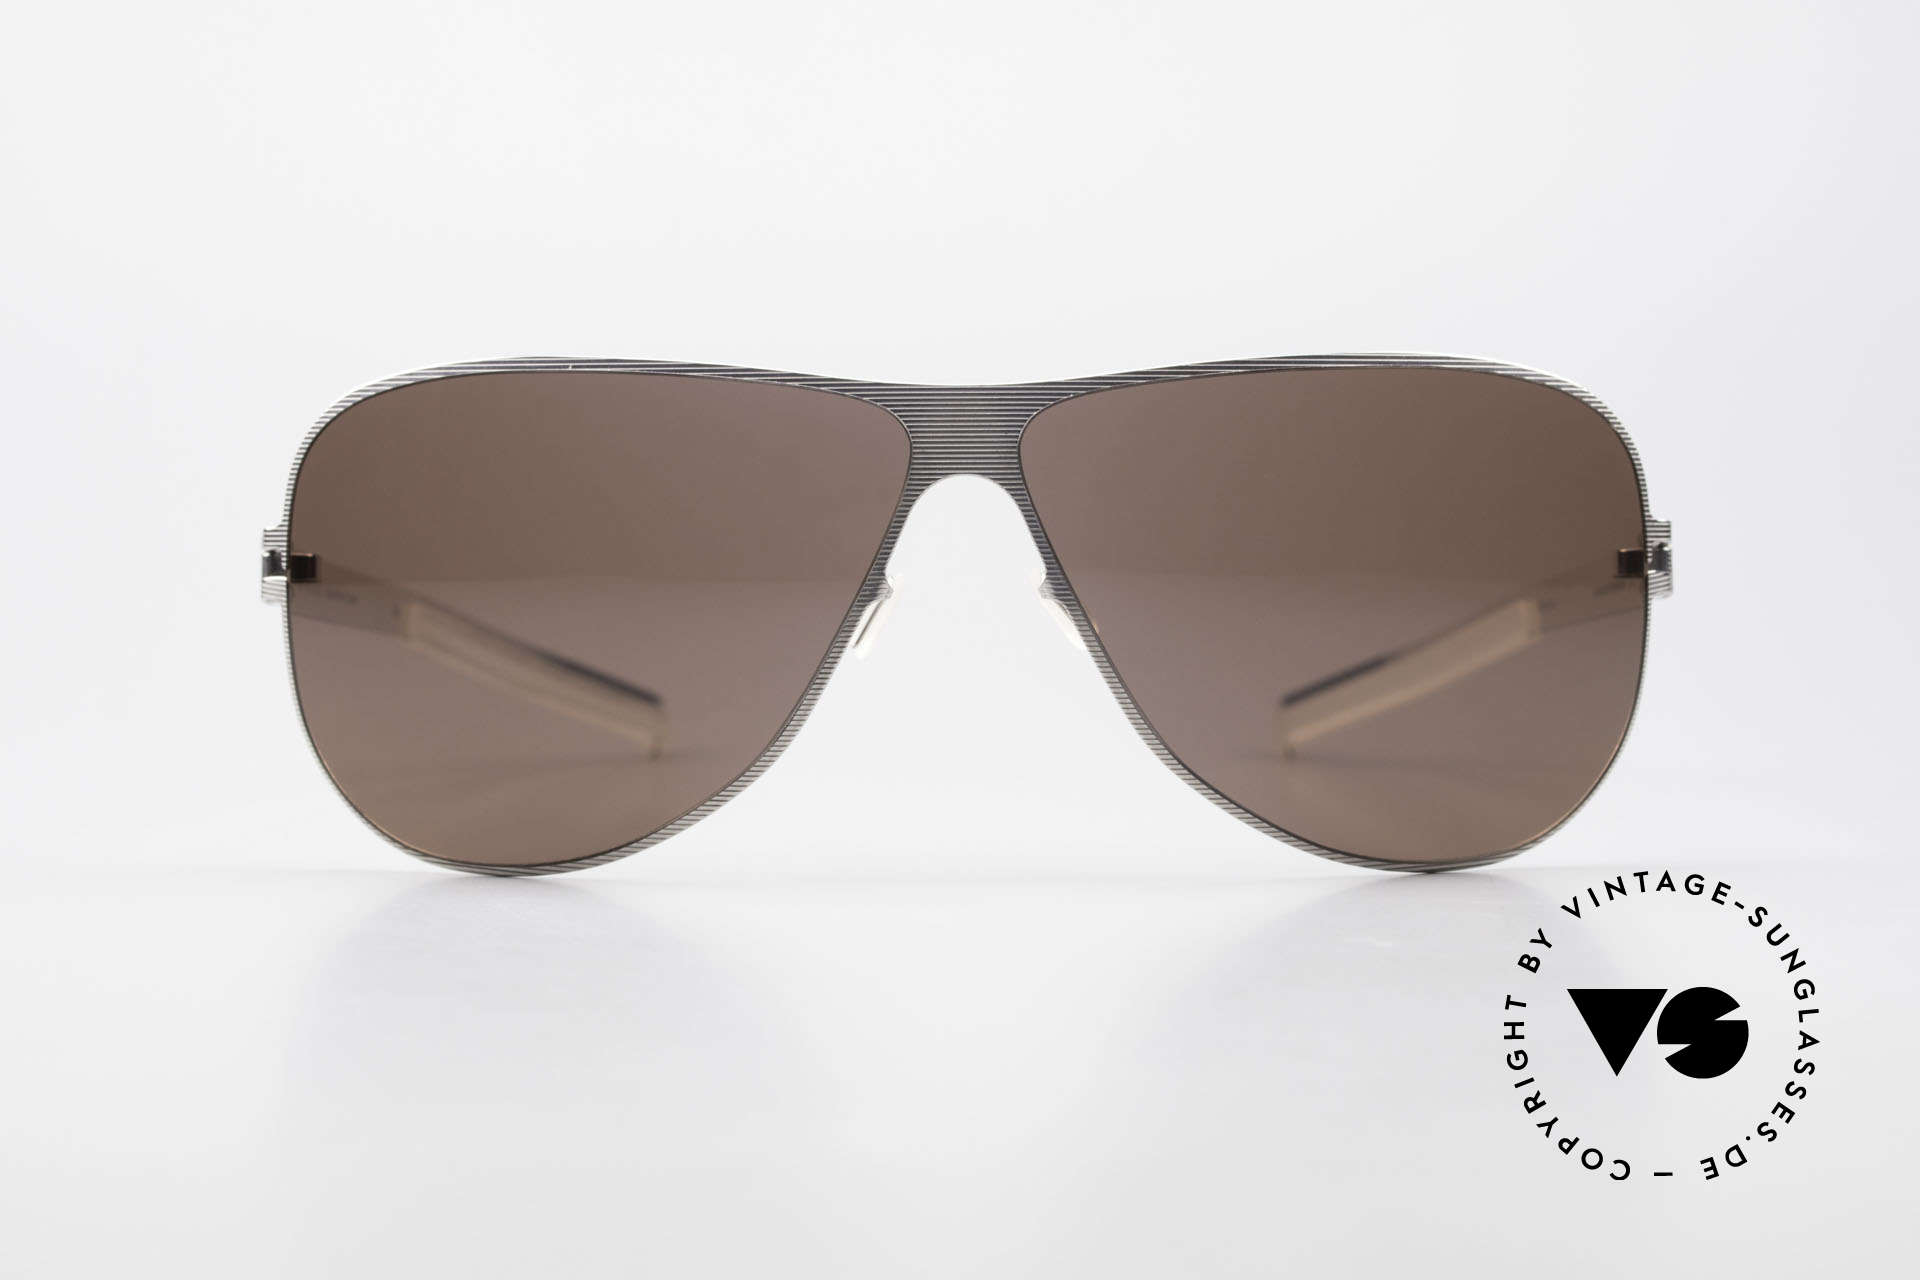 Mykita Ava Damen Aviator Brille Polarized, Mykita: die jüngste Marke in unserem vintage Sortiment, Passend für Damen